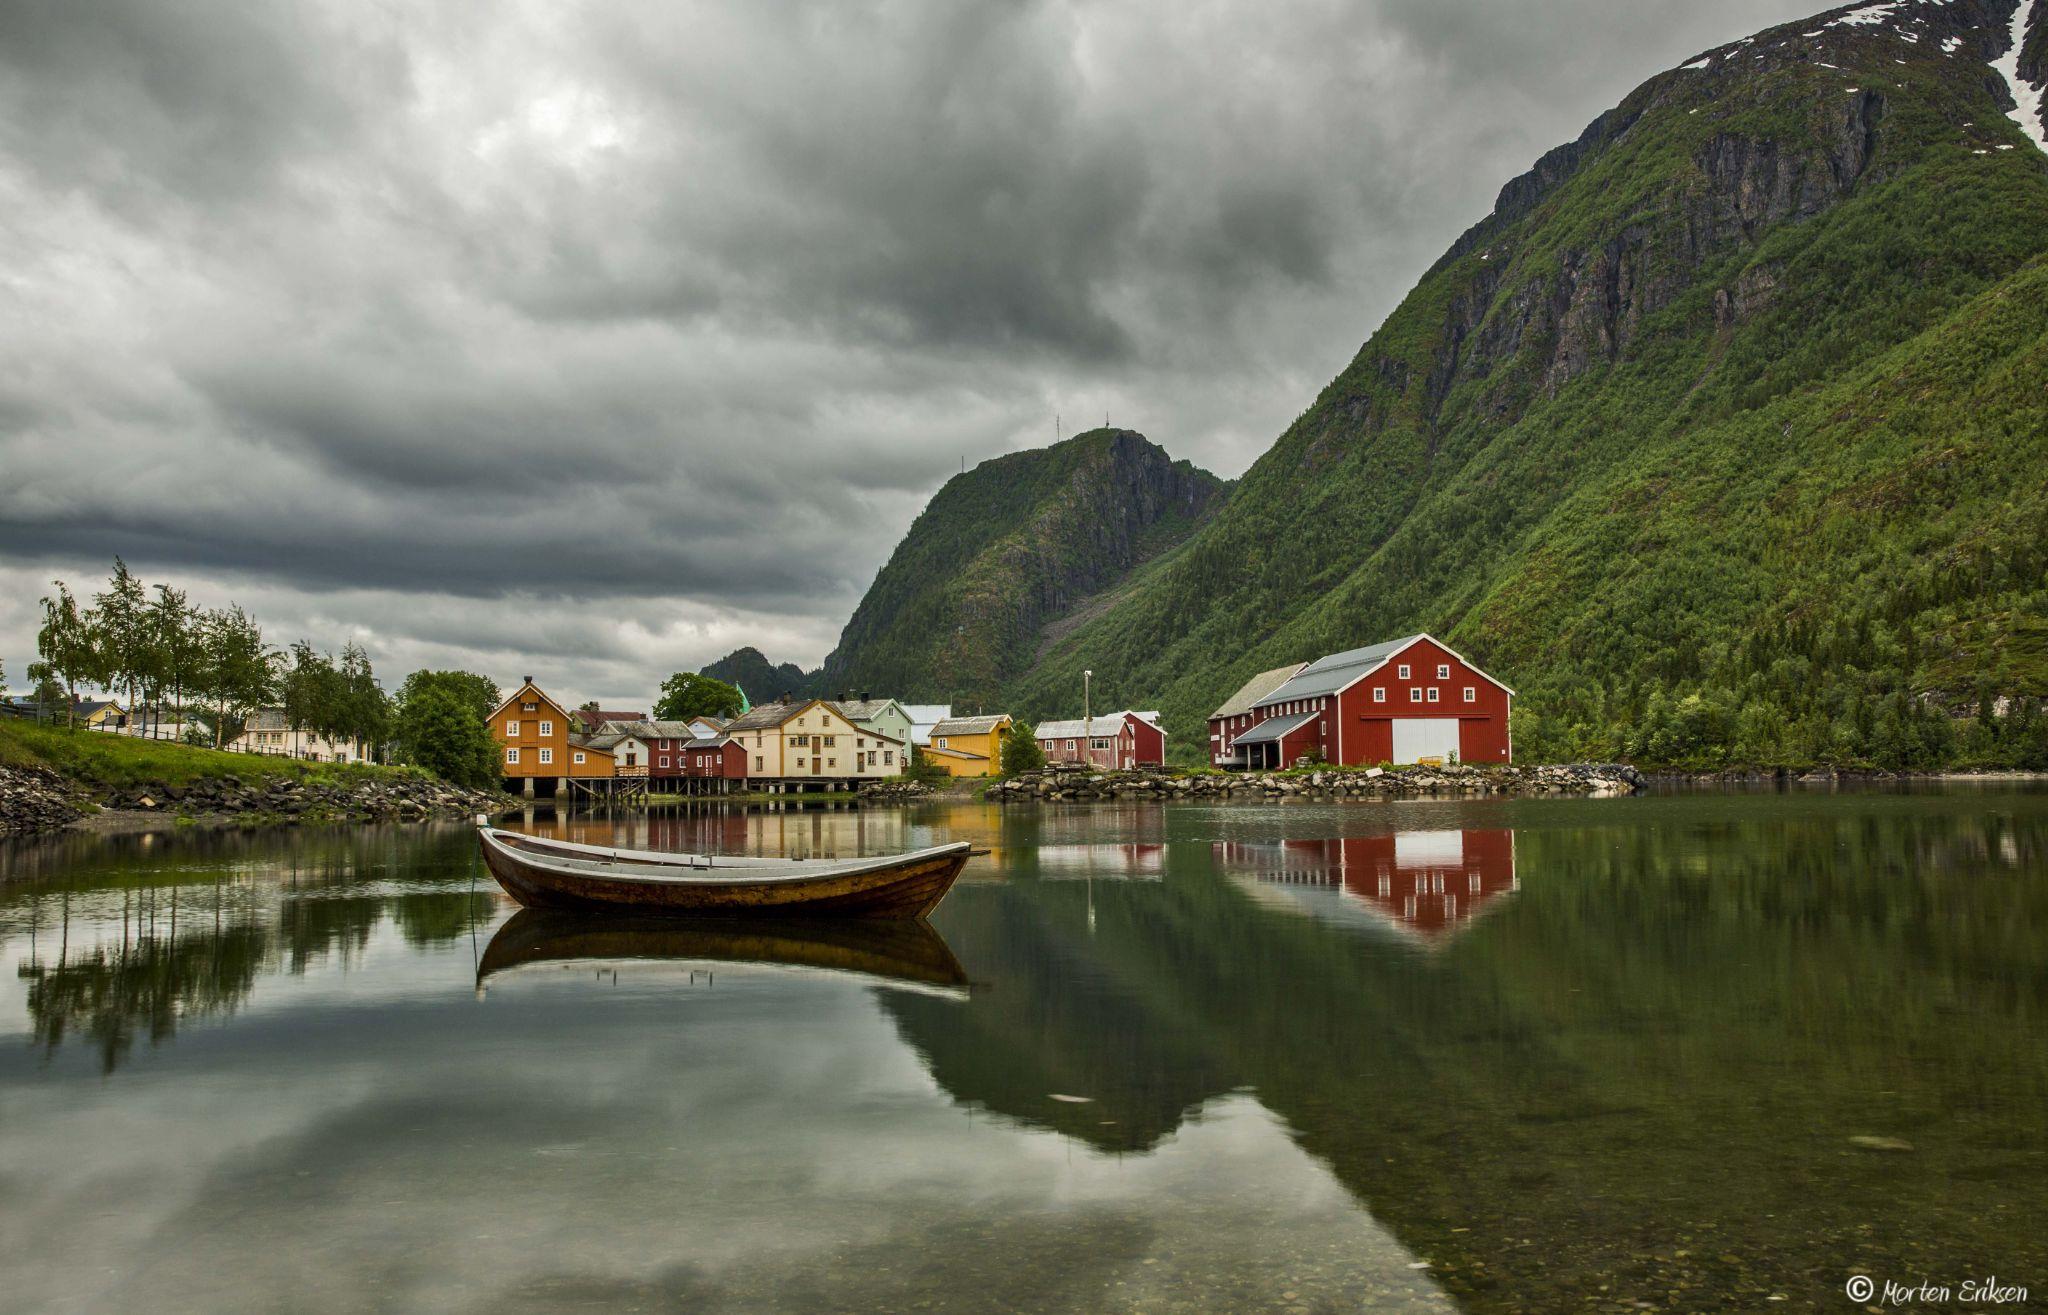 Bordvedneset, Mosjøen. by Morten Eriksen